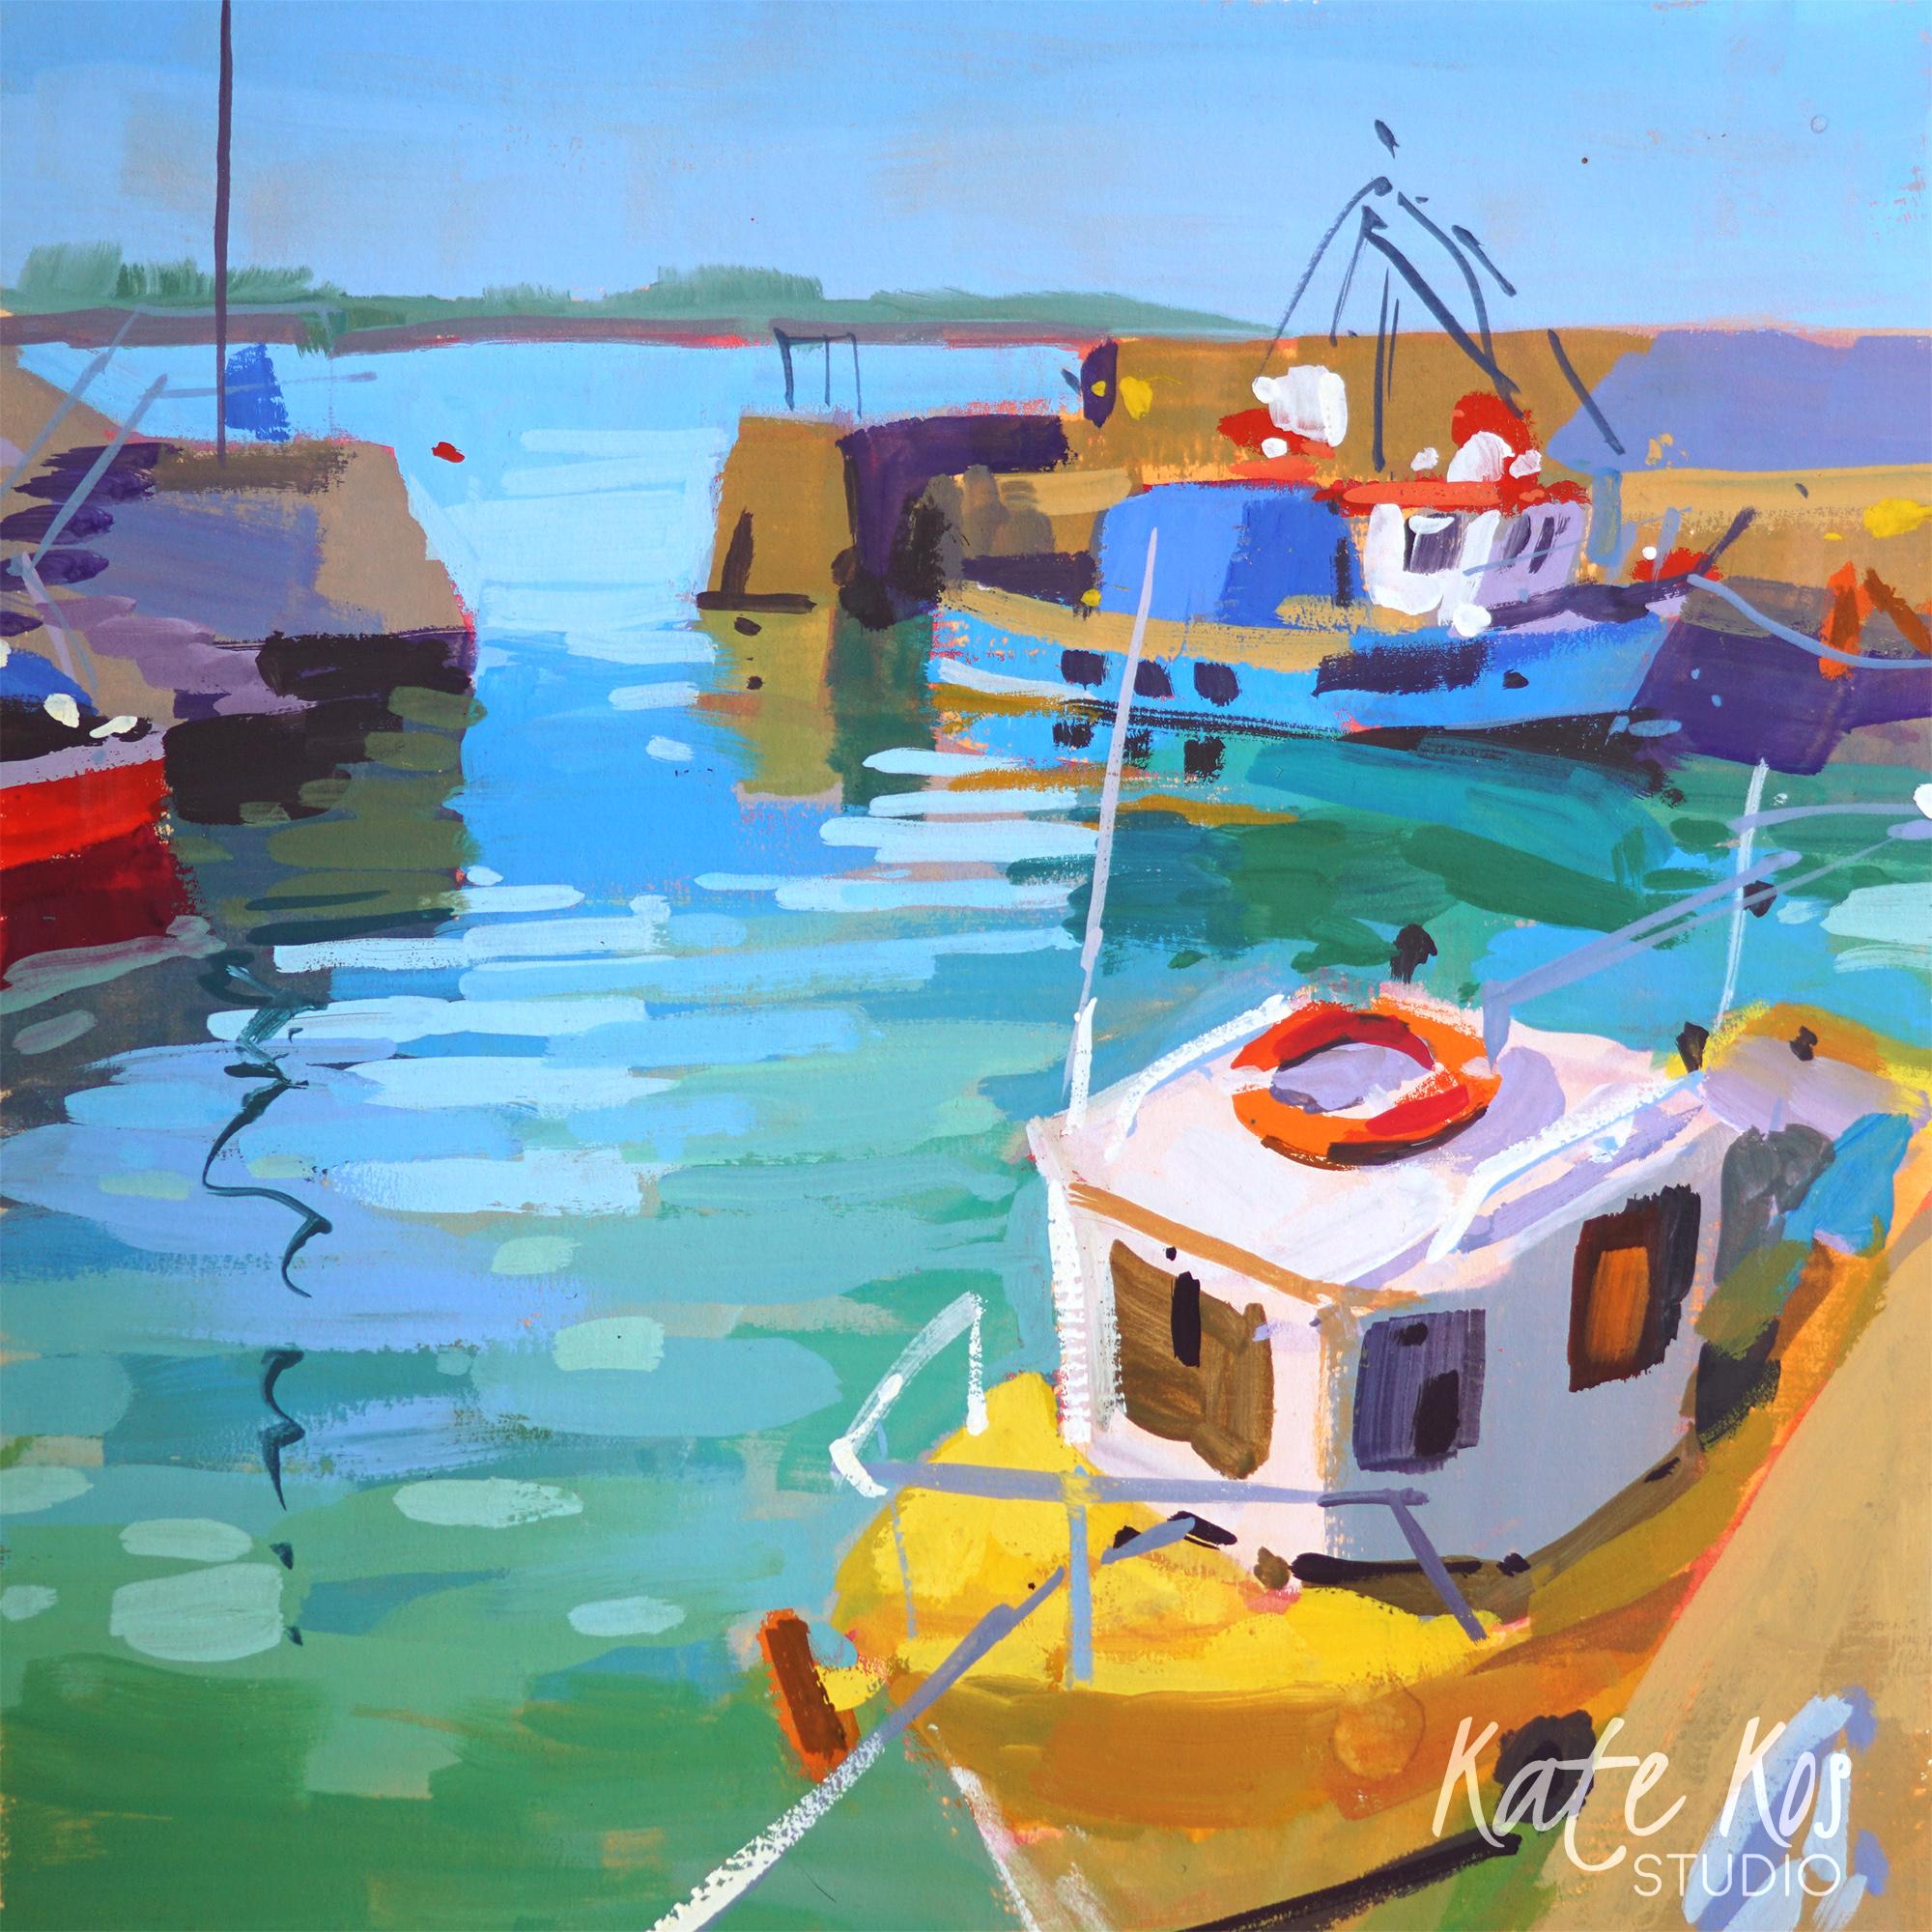 2021 art painting gouache seascape Fethard On Sea by Kate Kos - Square Away 5 .jpg